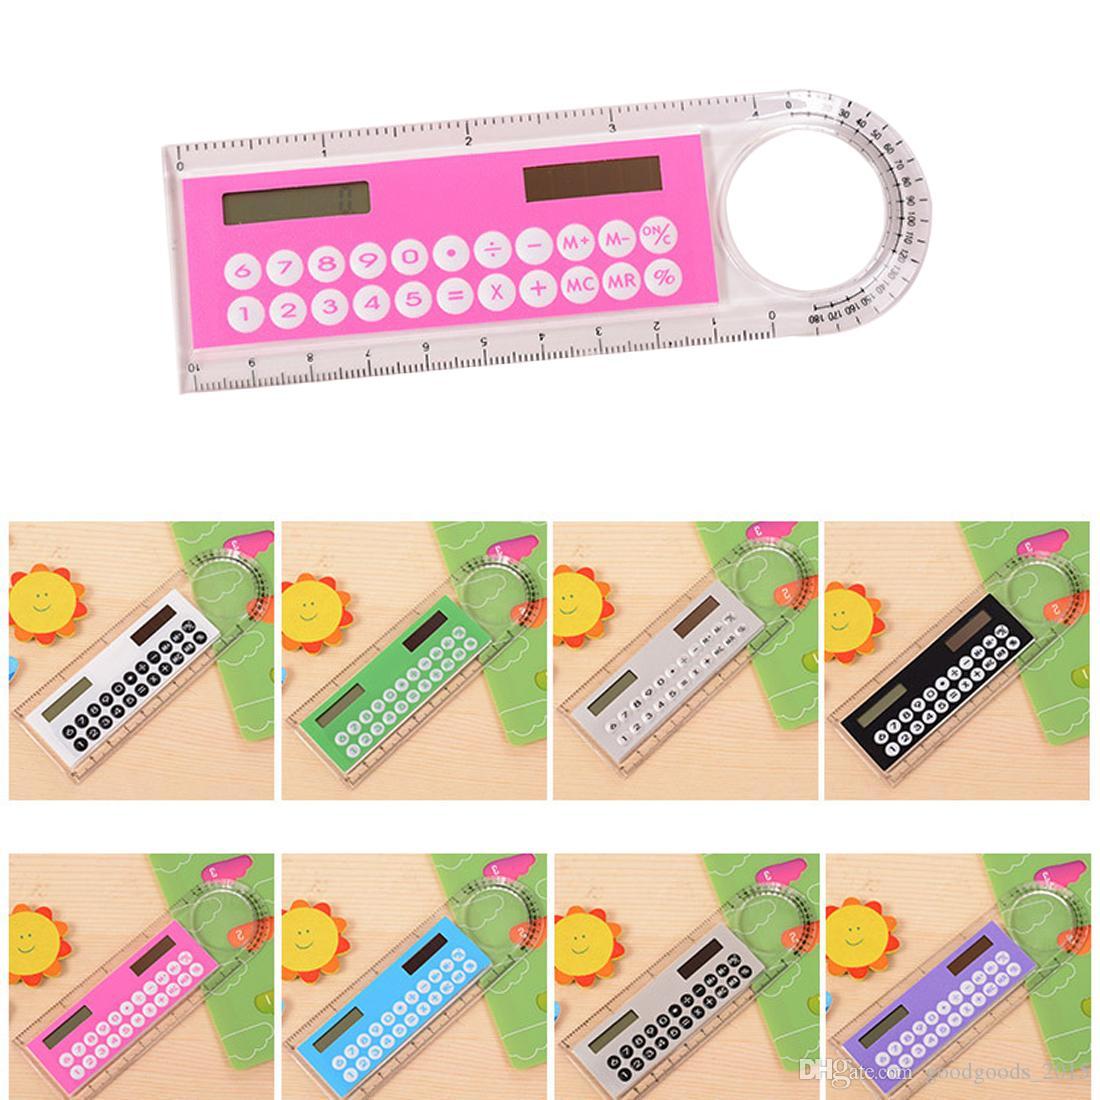 Color Random Hot Selling Solar Mini Calculator Magnifier Multifunction 10cm Ultra-thin Ruler Calculadora Office Supplies DLH209